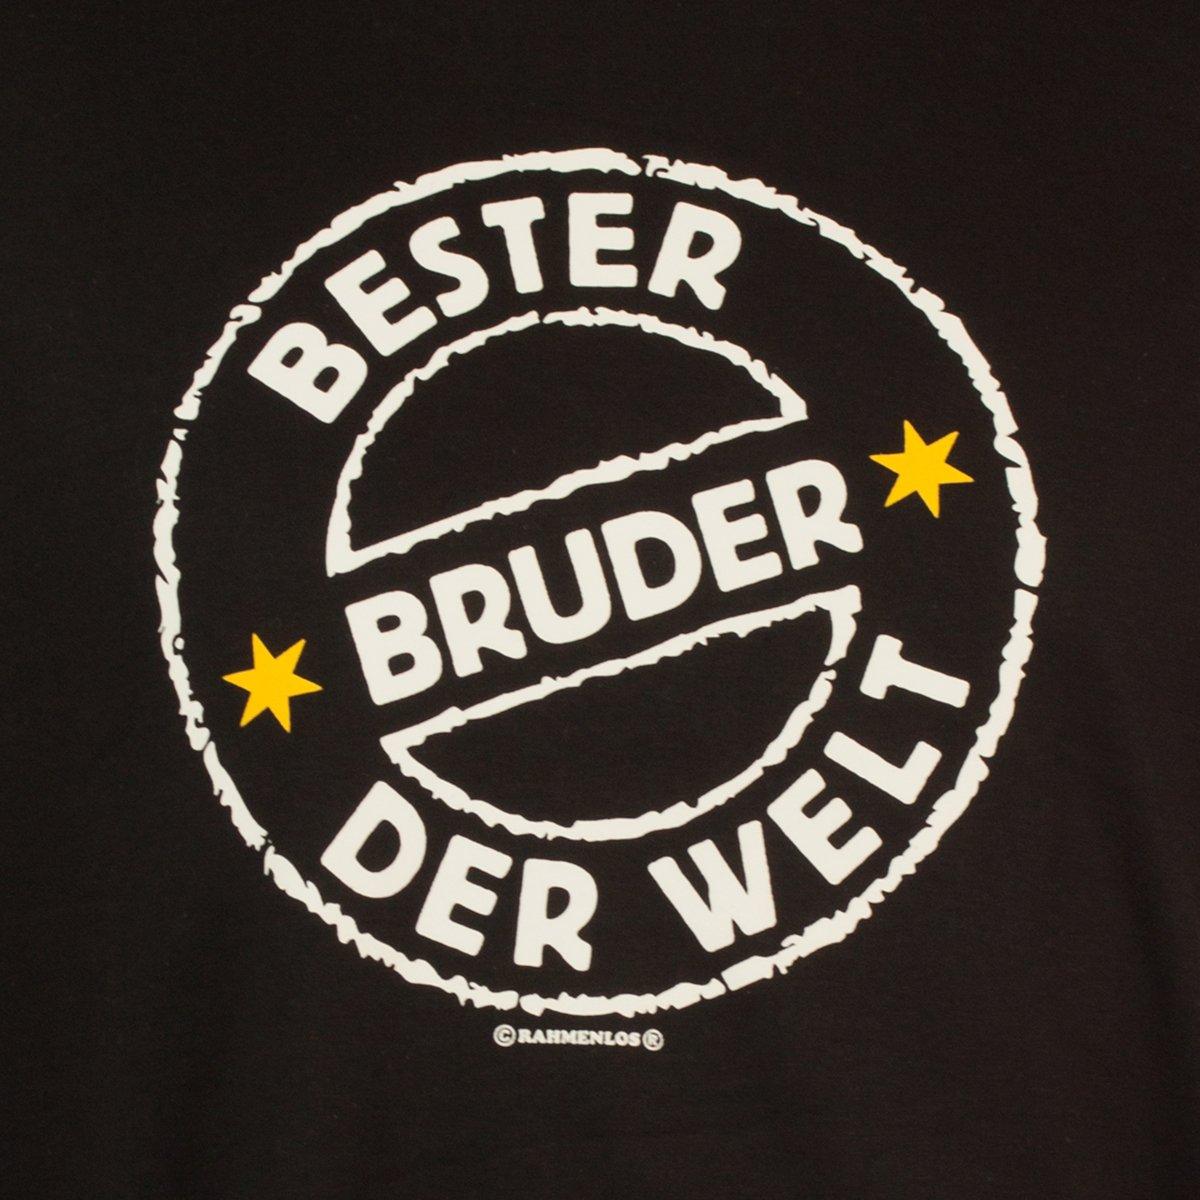 T-Shirt - Bester Bruder